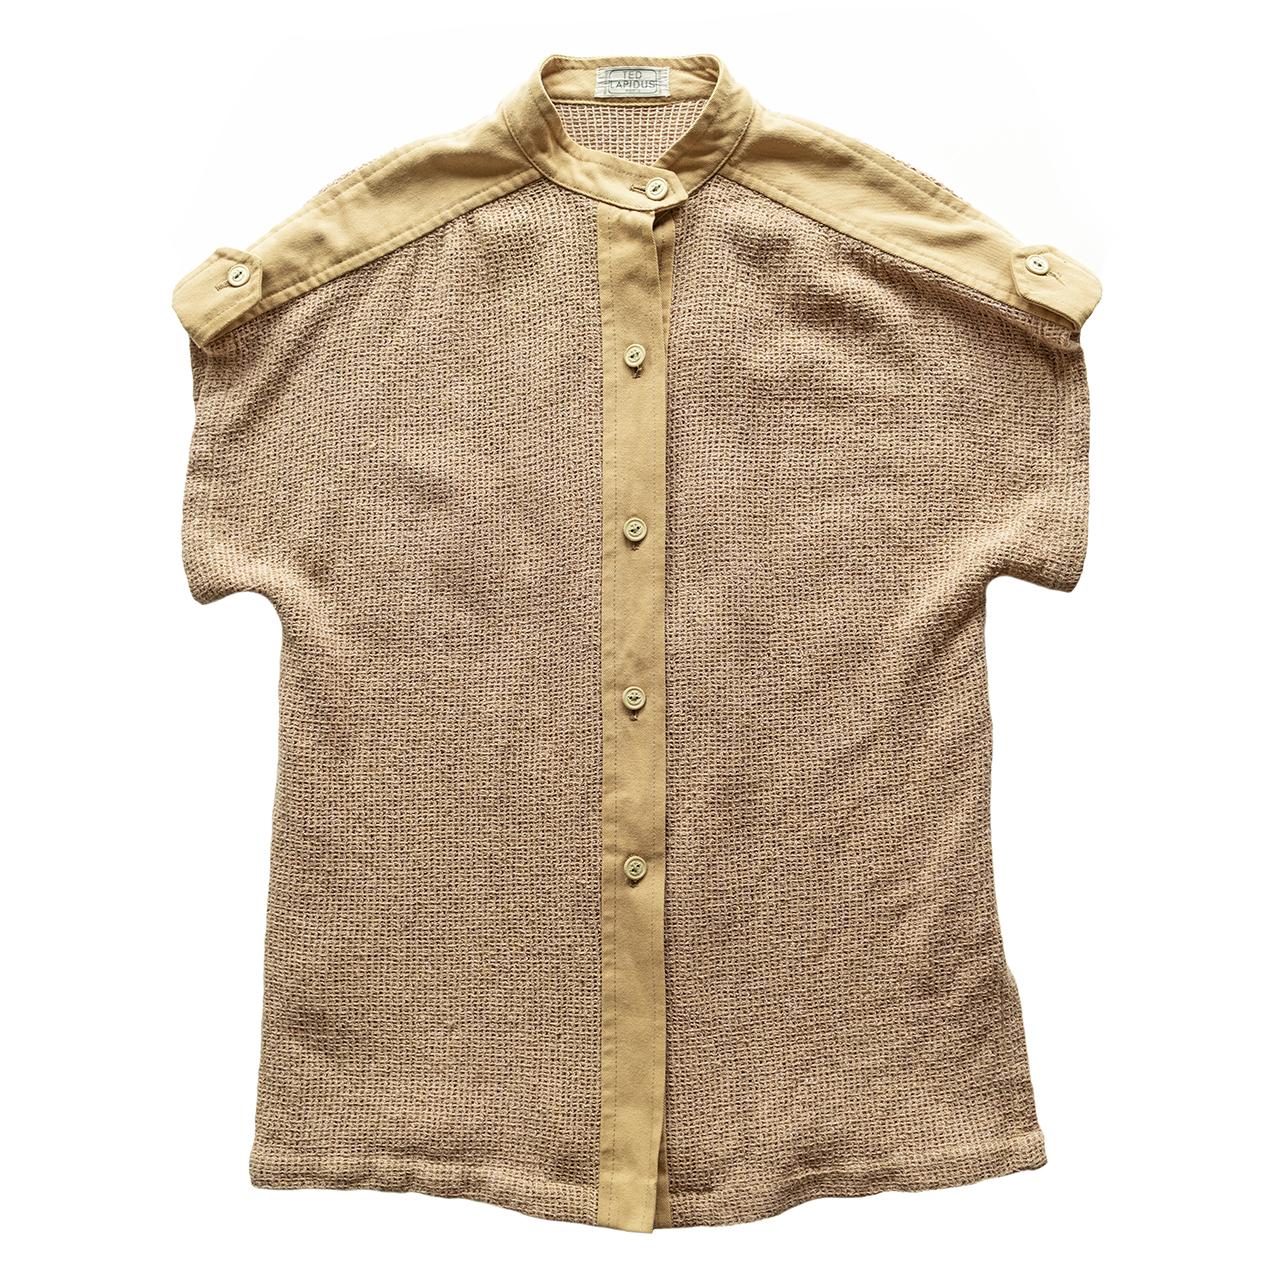 1980s Ted Lapidusシャツ